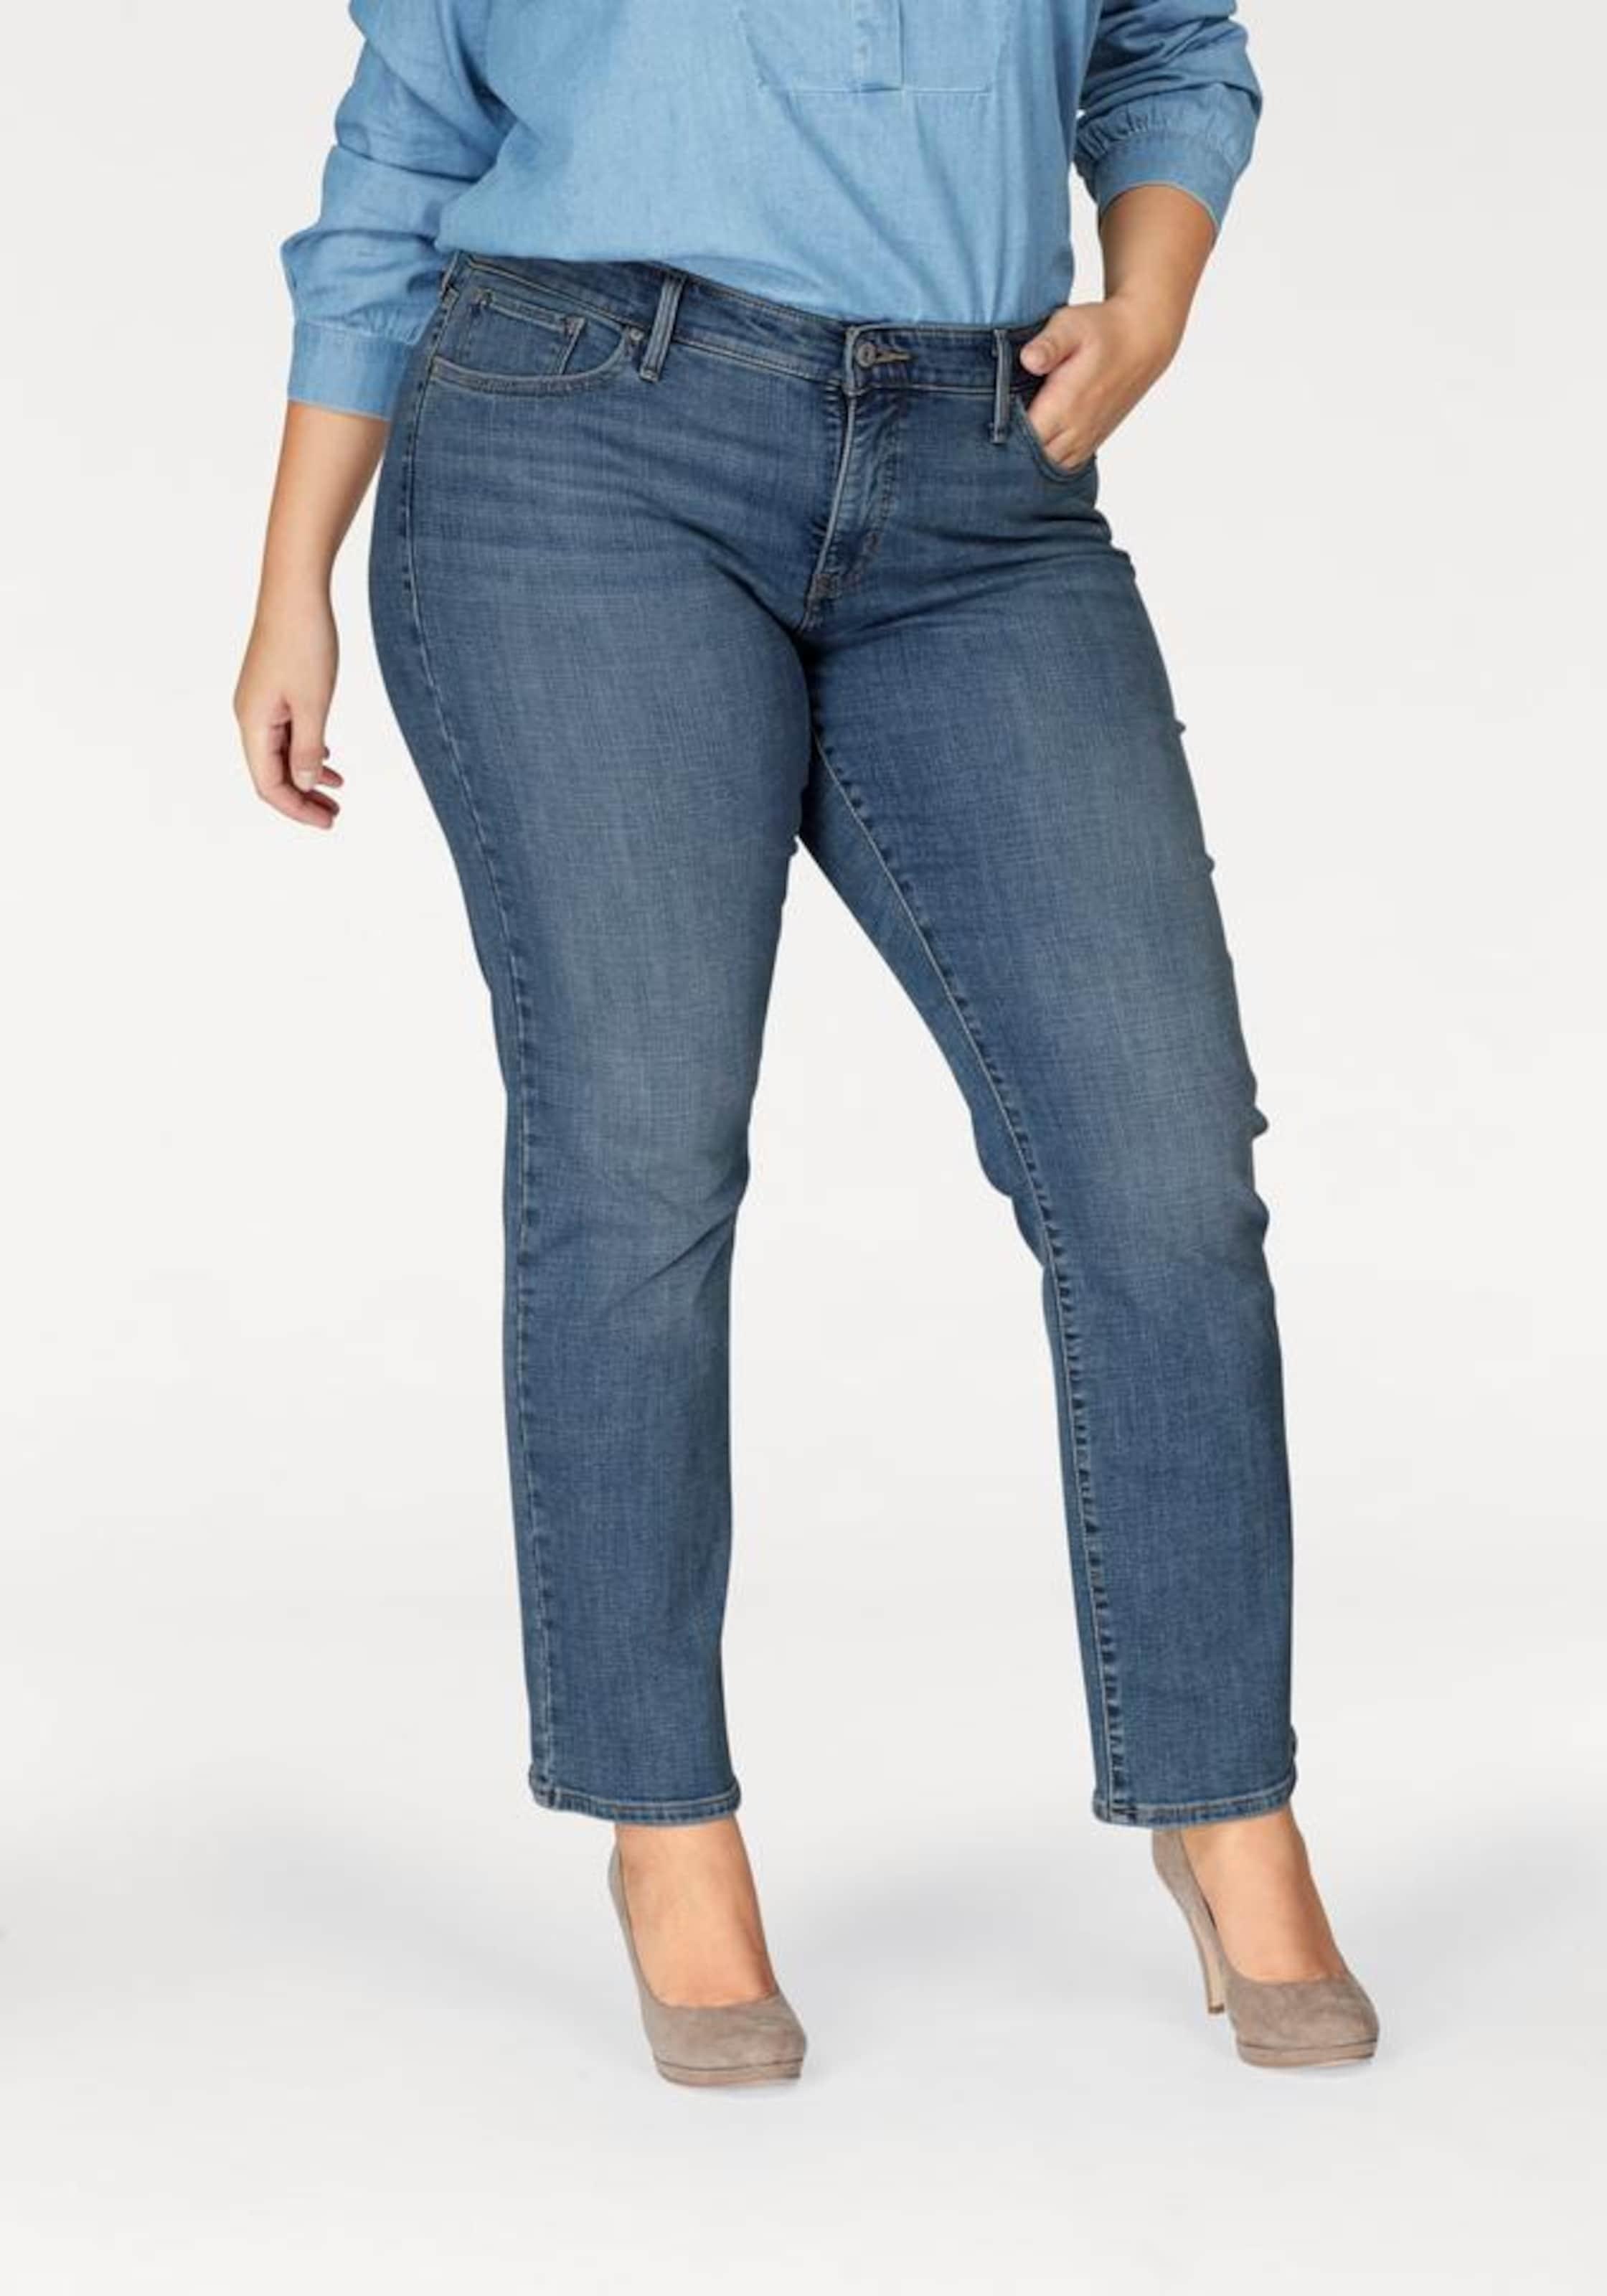 LEVI'S Straight-Jeans Beliebt Rabatt Großhandelspreis Rabatt Top-Qualität Rabatt W3DpD